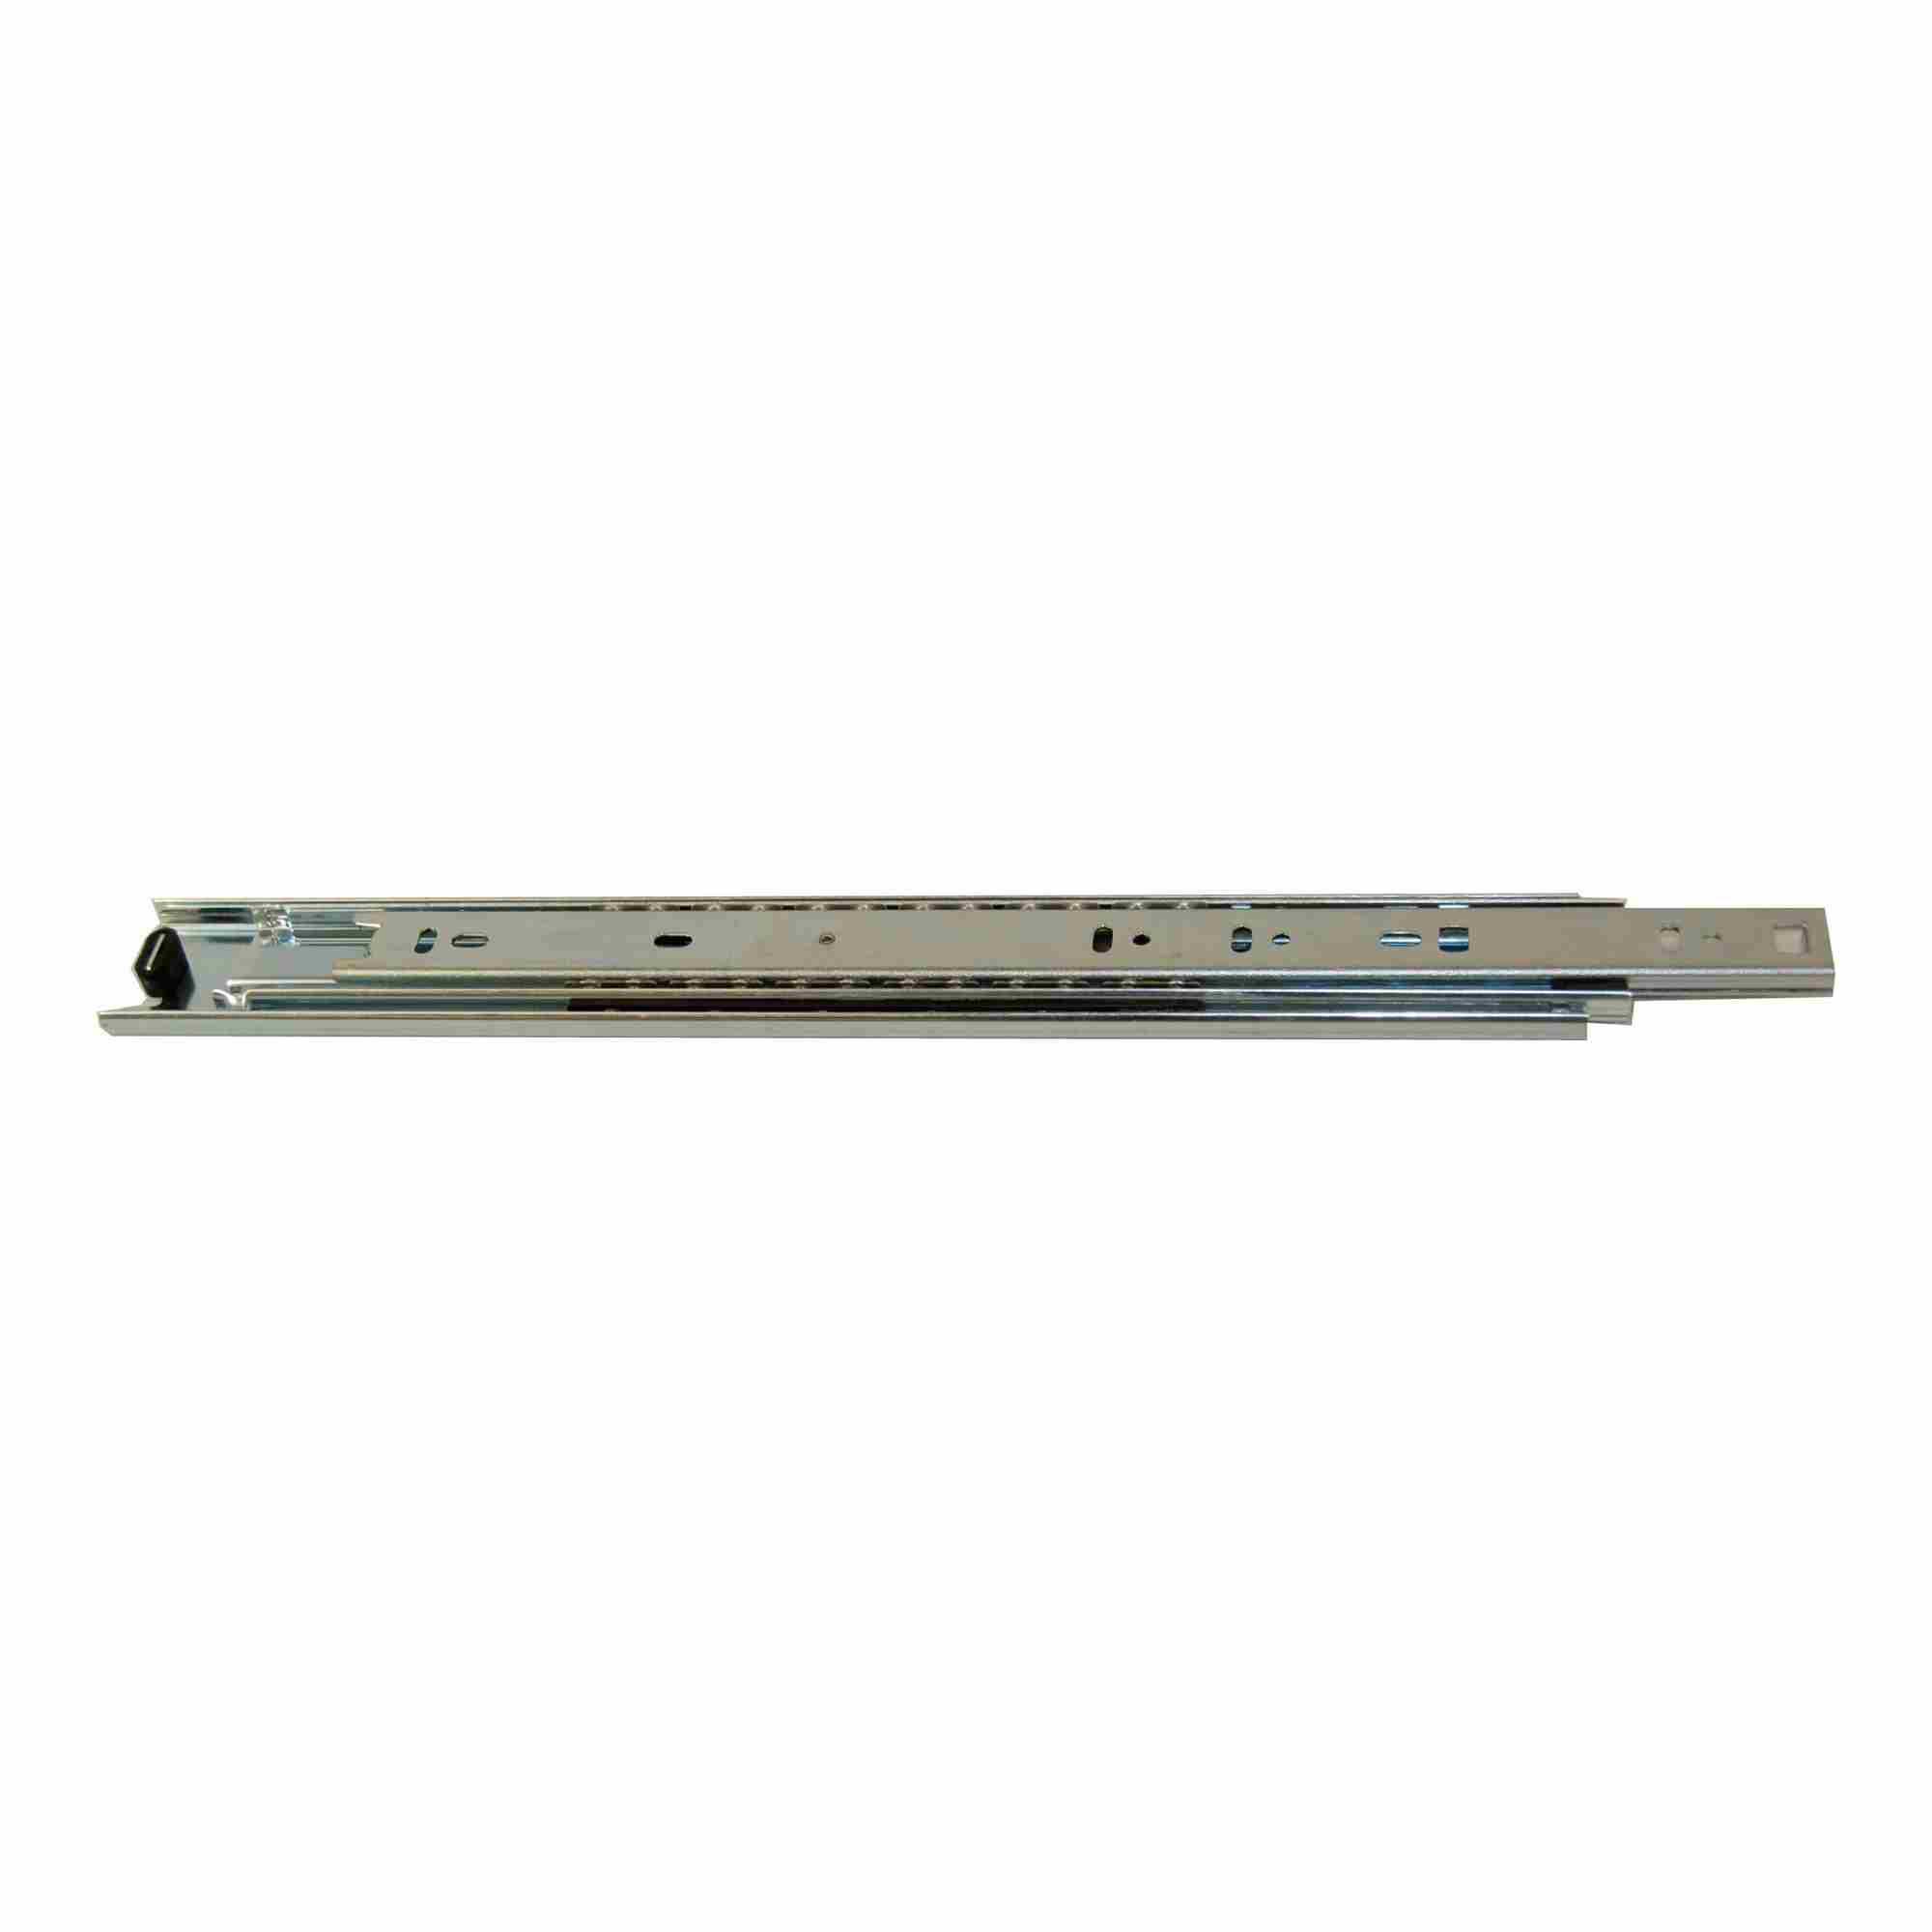 5218JA1007B Genuine OEM For LG Rail,Slide